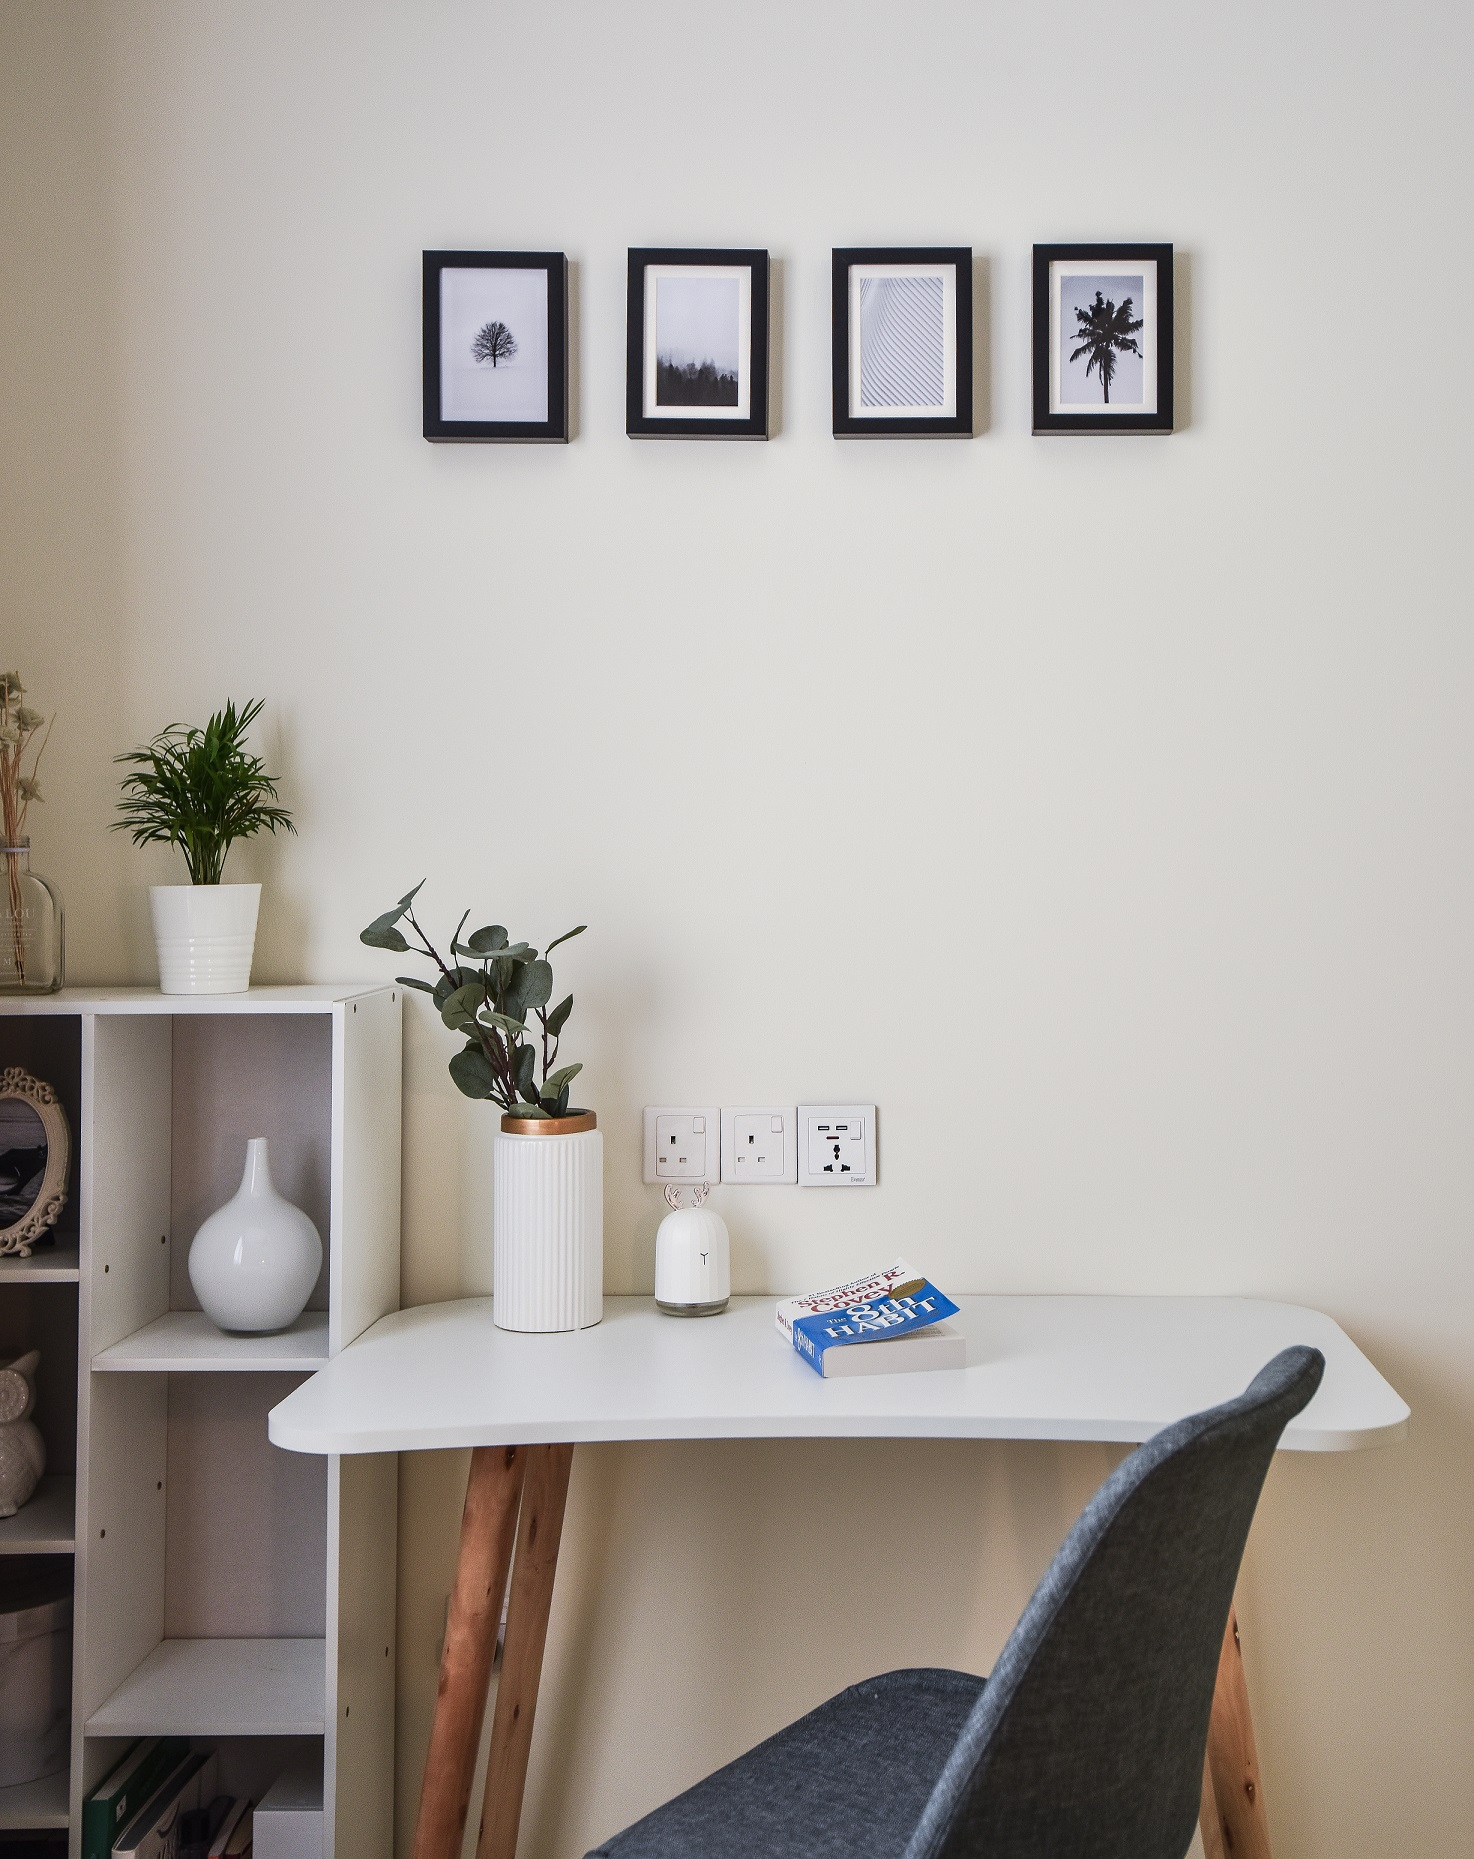 lemon-chiffon-study-room